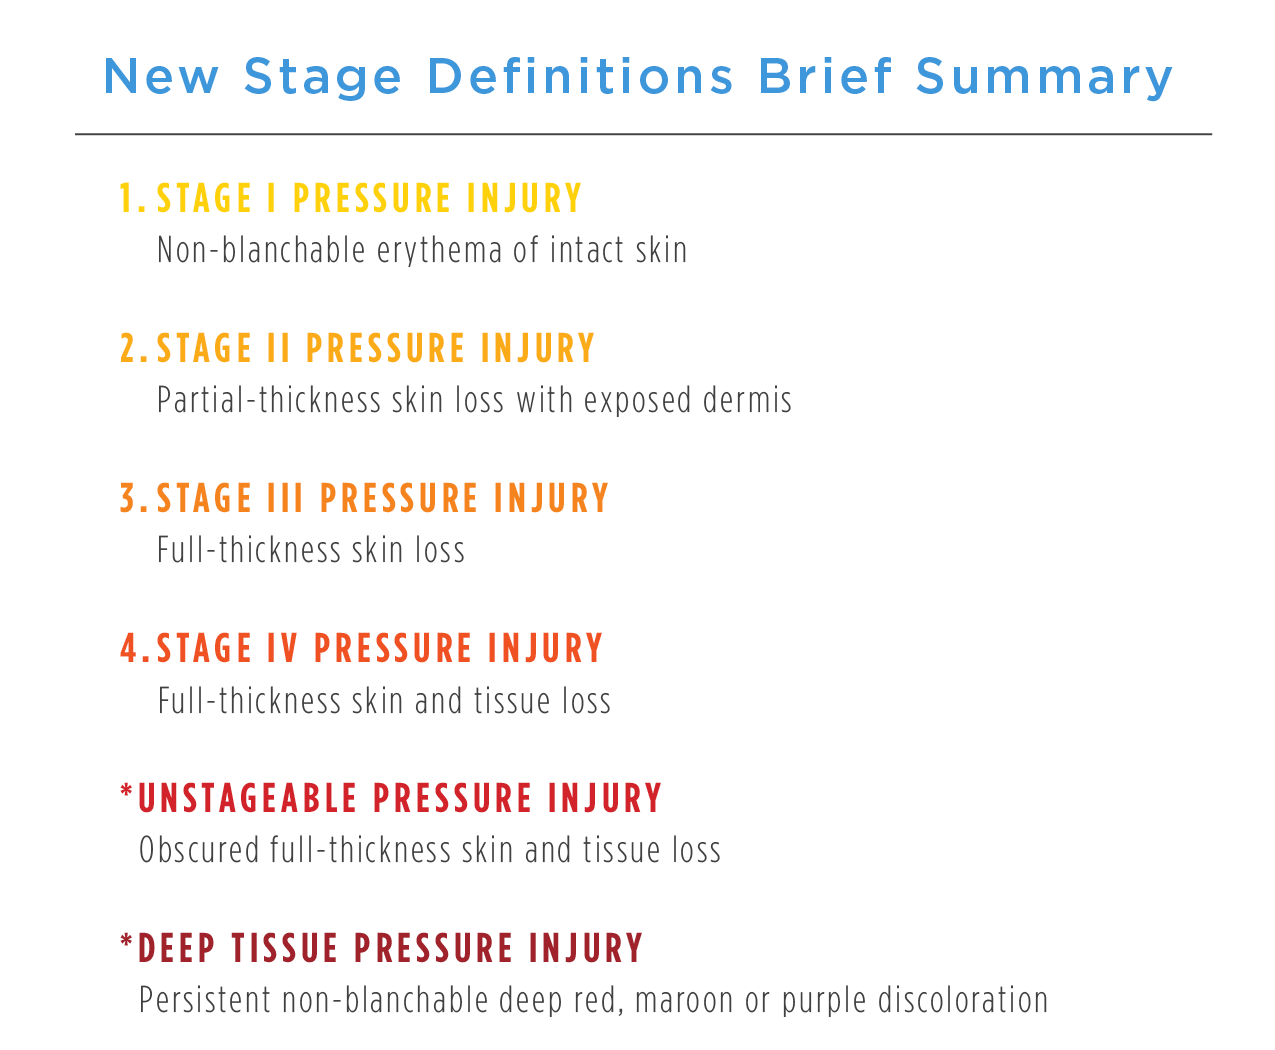 Pressure Injury Stage Definitions